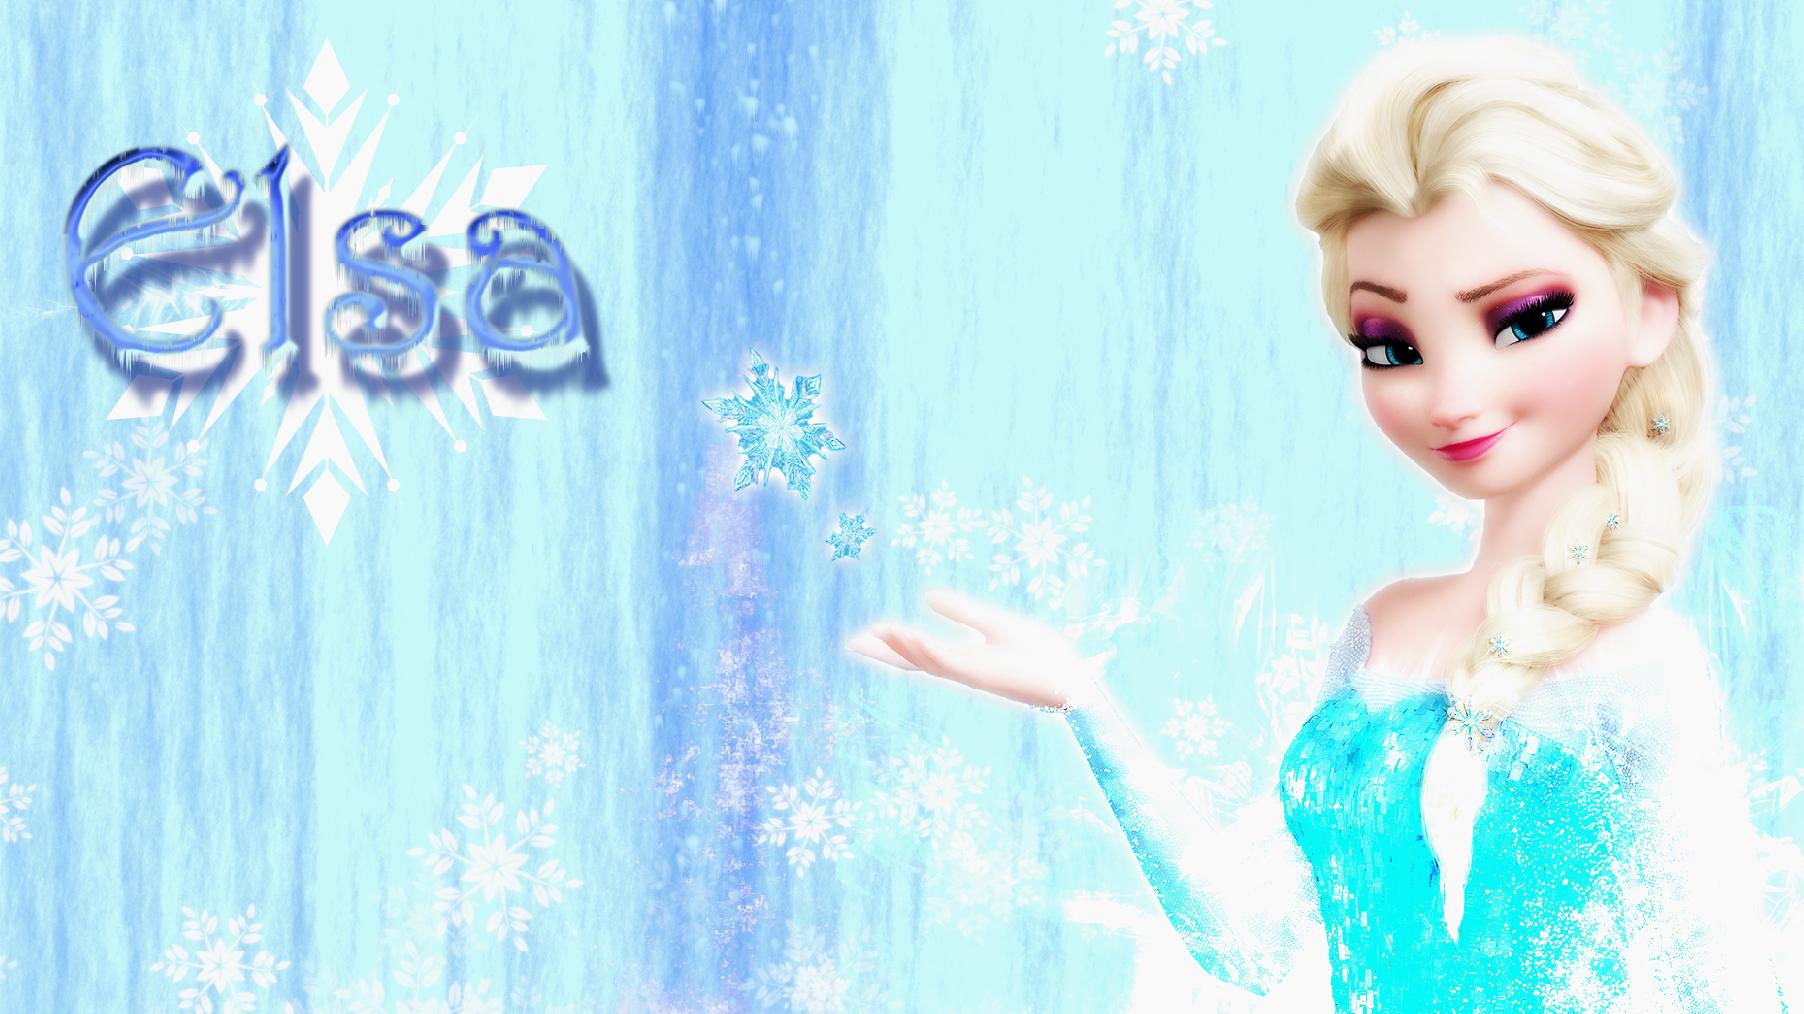 Easy Wallpaper Frozen Elsa Wallpaper Wallpapersafari